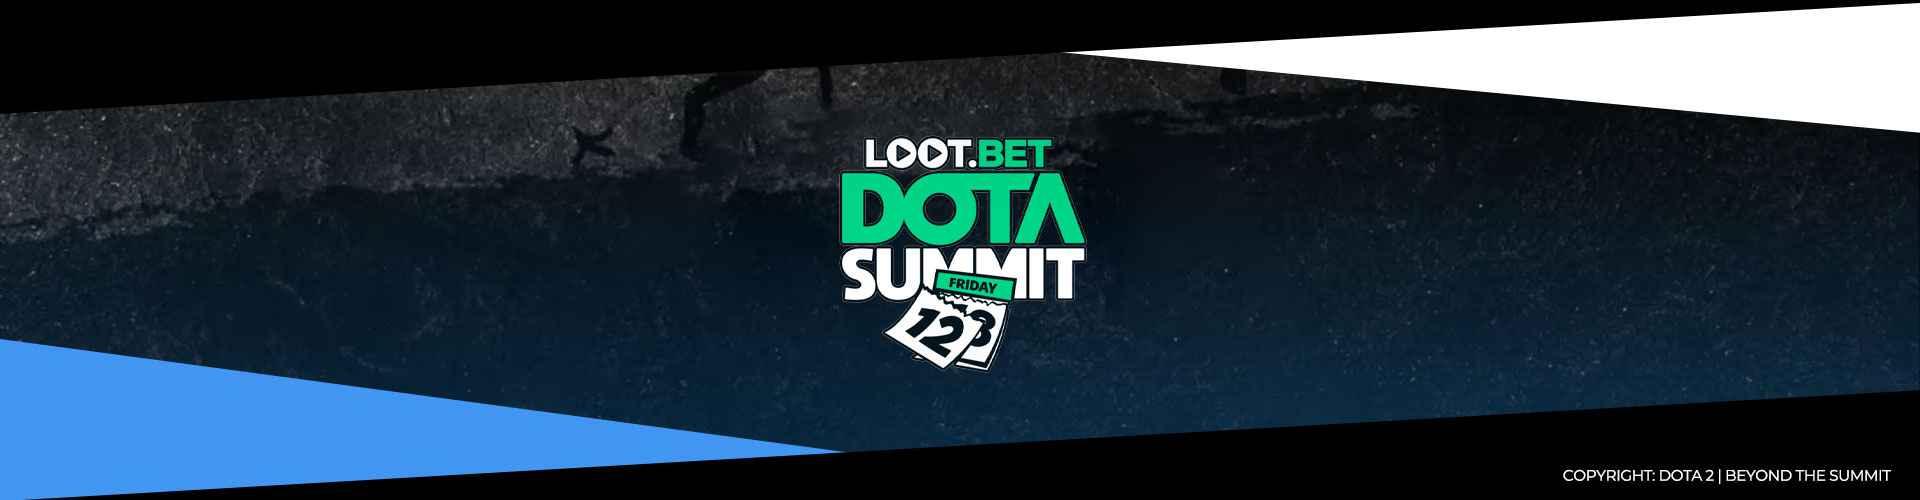 Eventsida för LOOT.BET Dota Summit 12.